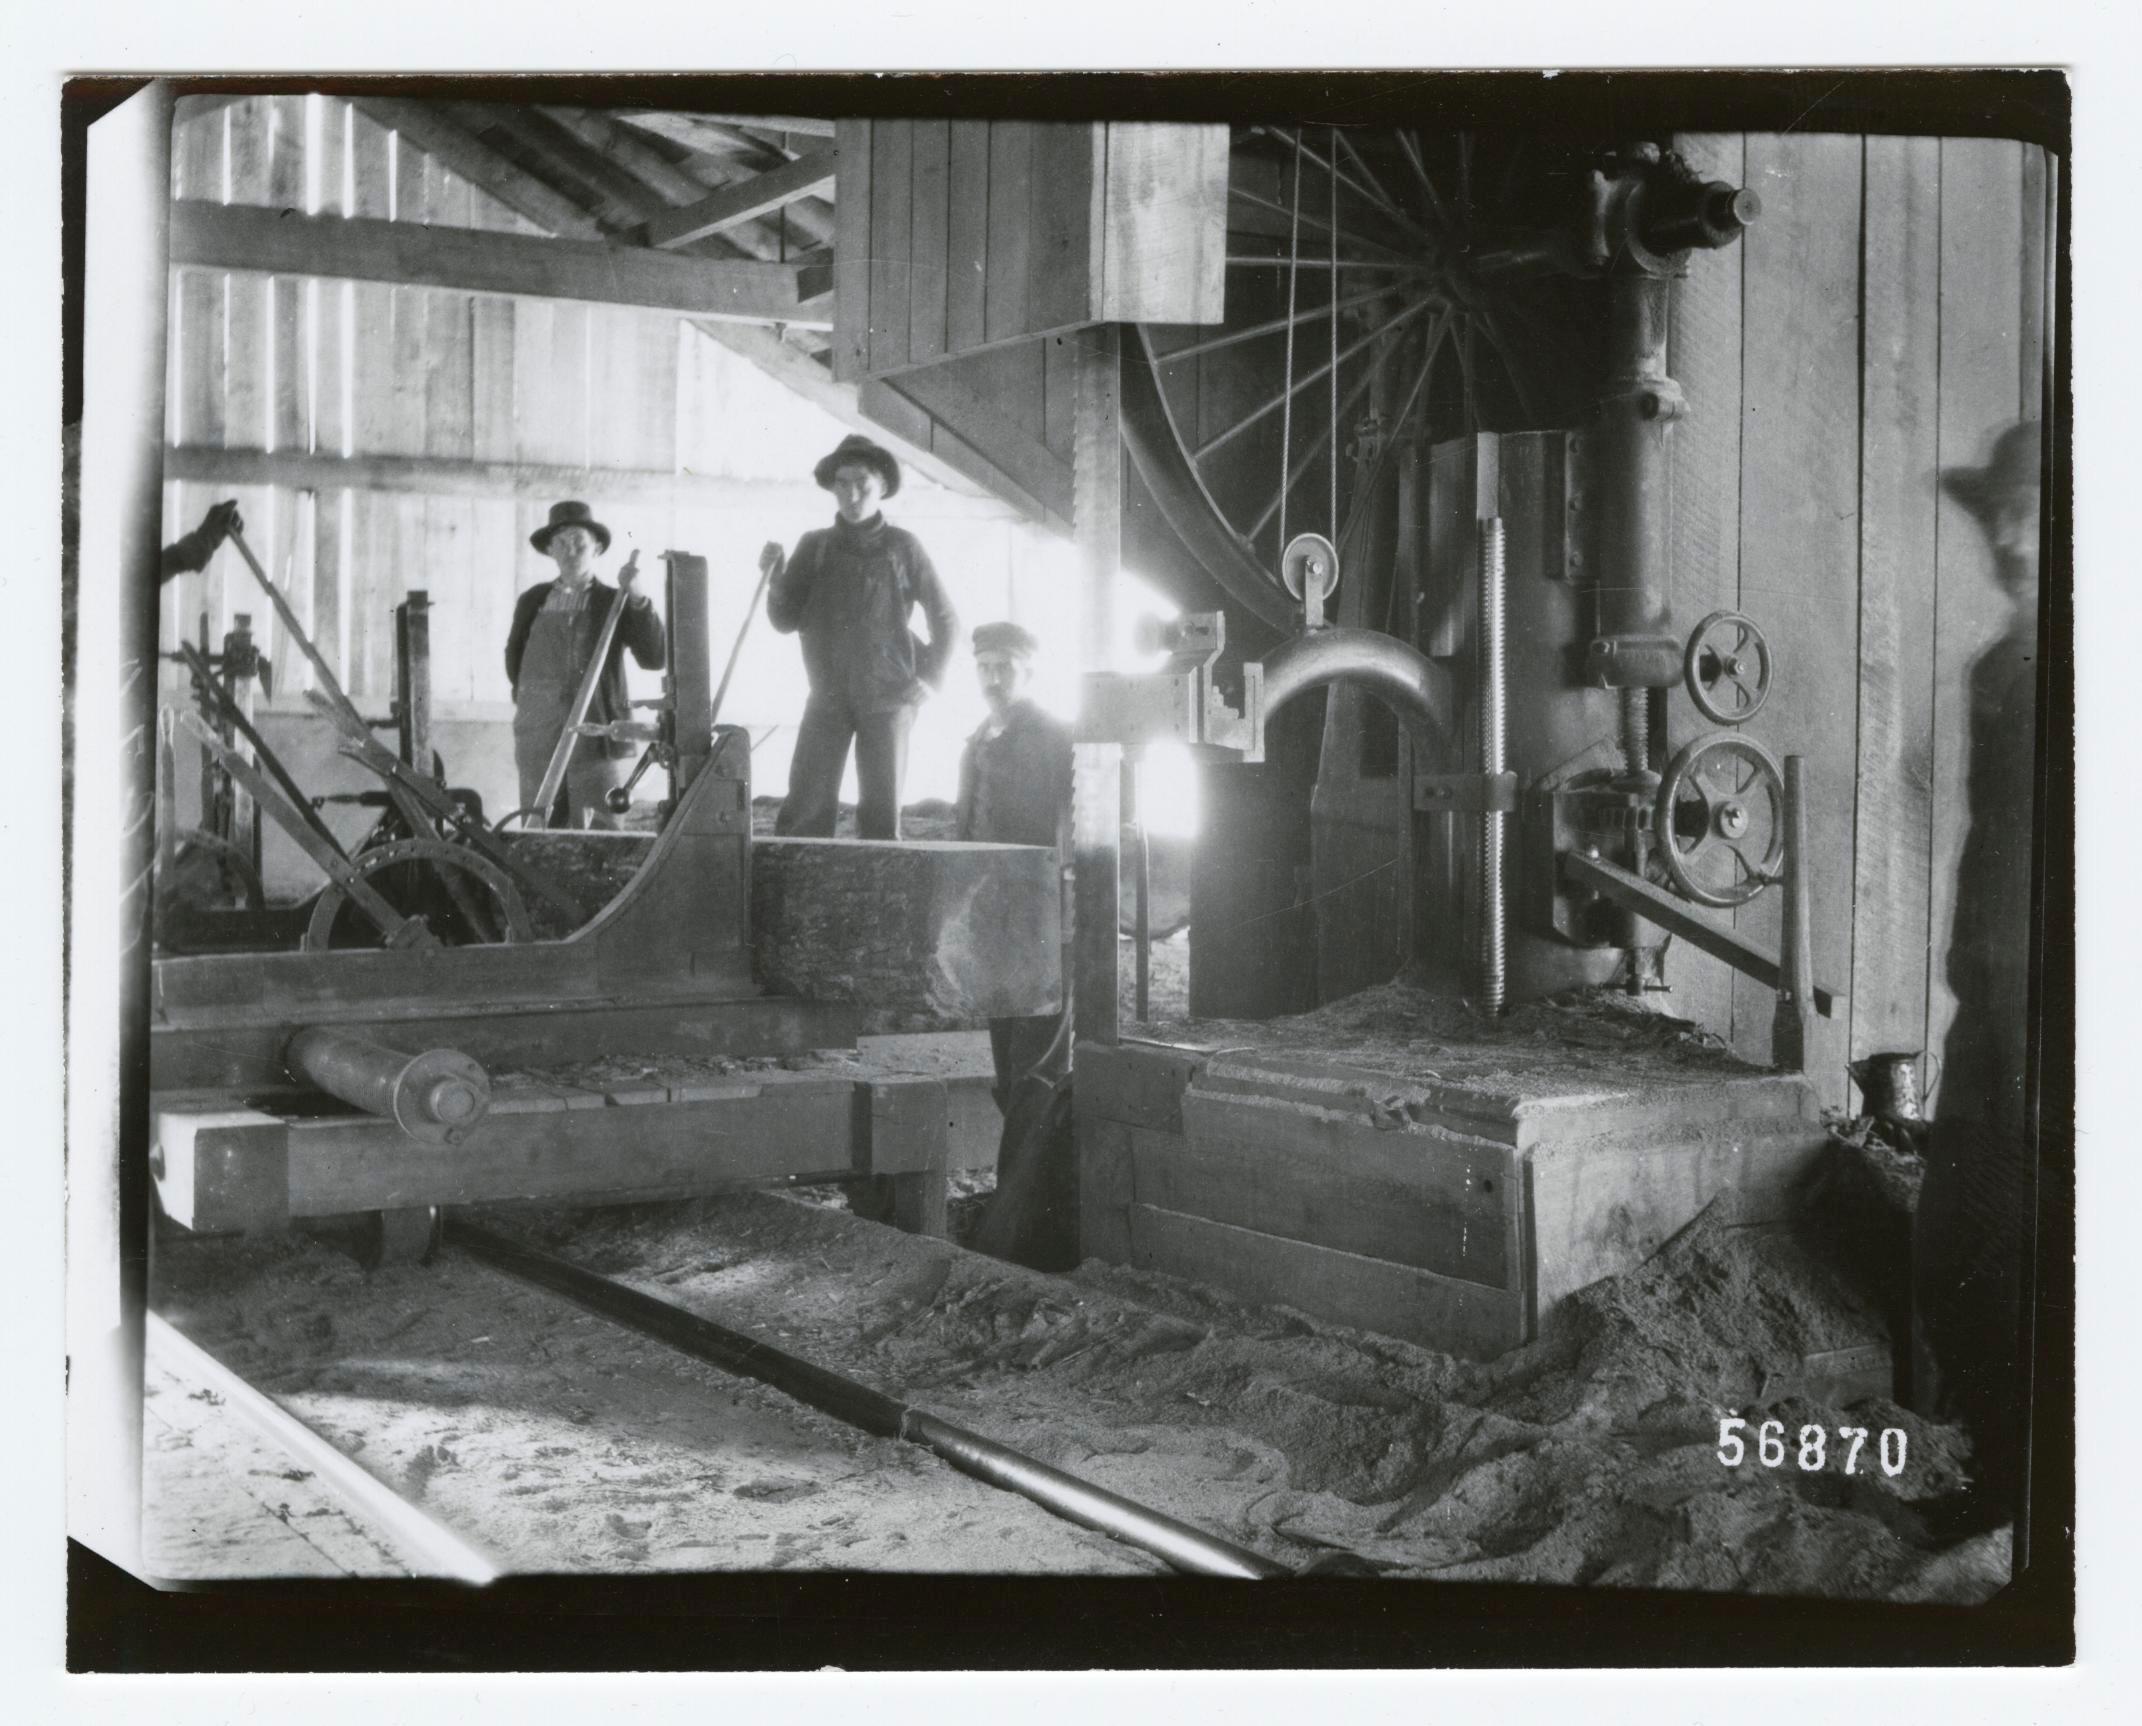 1900 3 men posing for the camera sawmill interior.